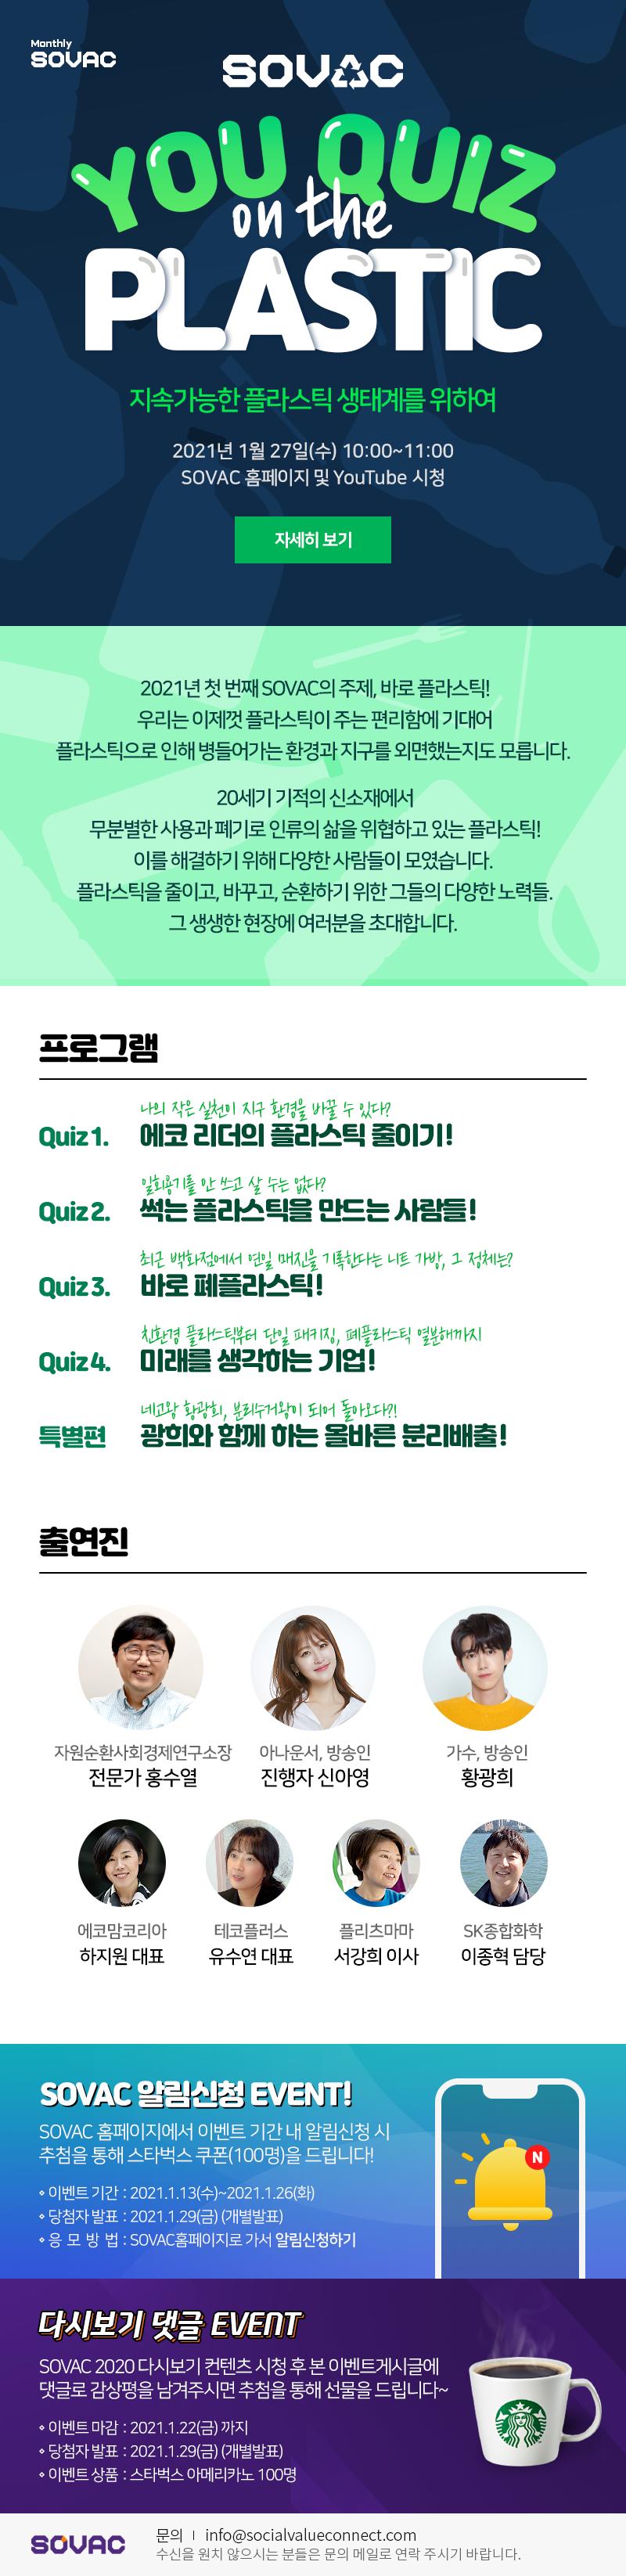 Monthly_01월_DM_210112_일반용